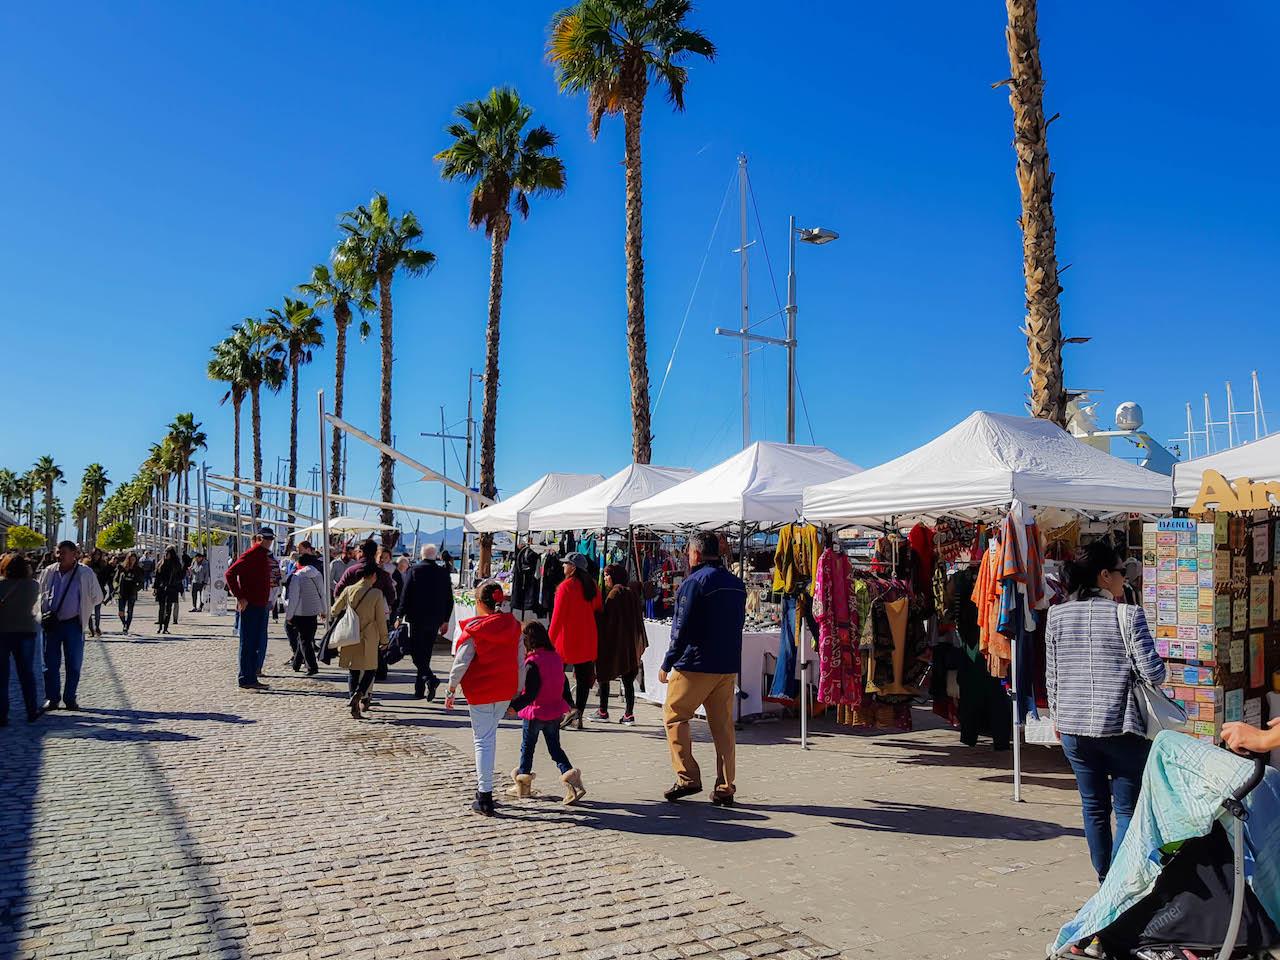 Buntes Markttreiben in Málaga.